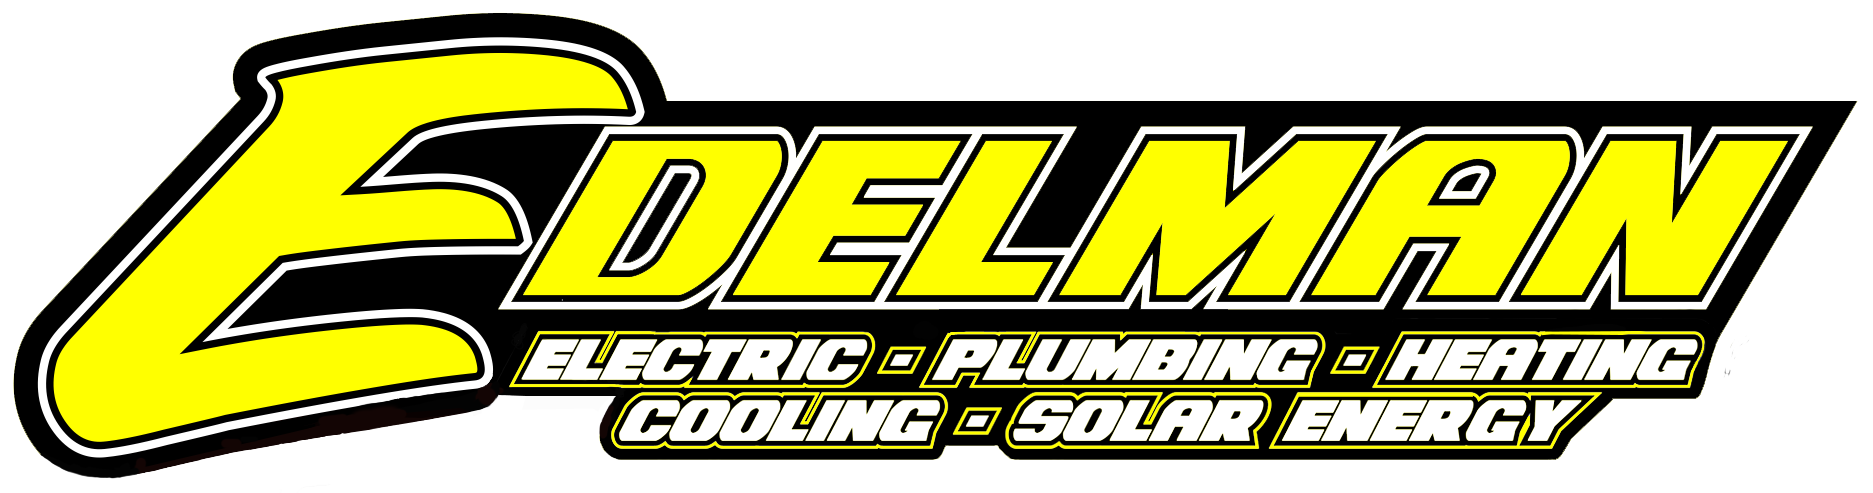 Edelman Electric logo